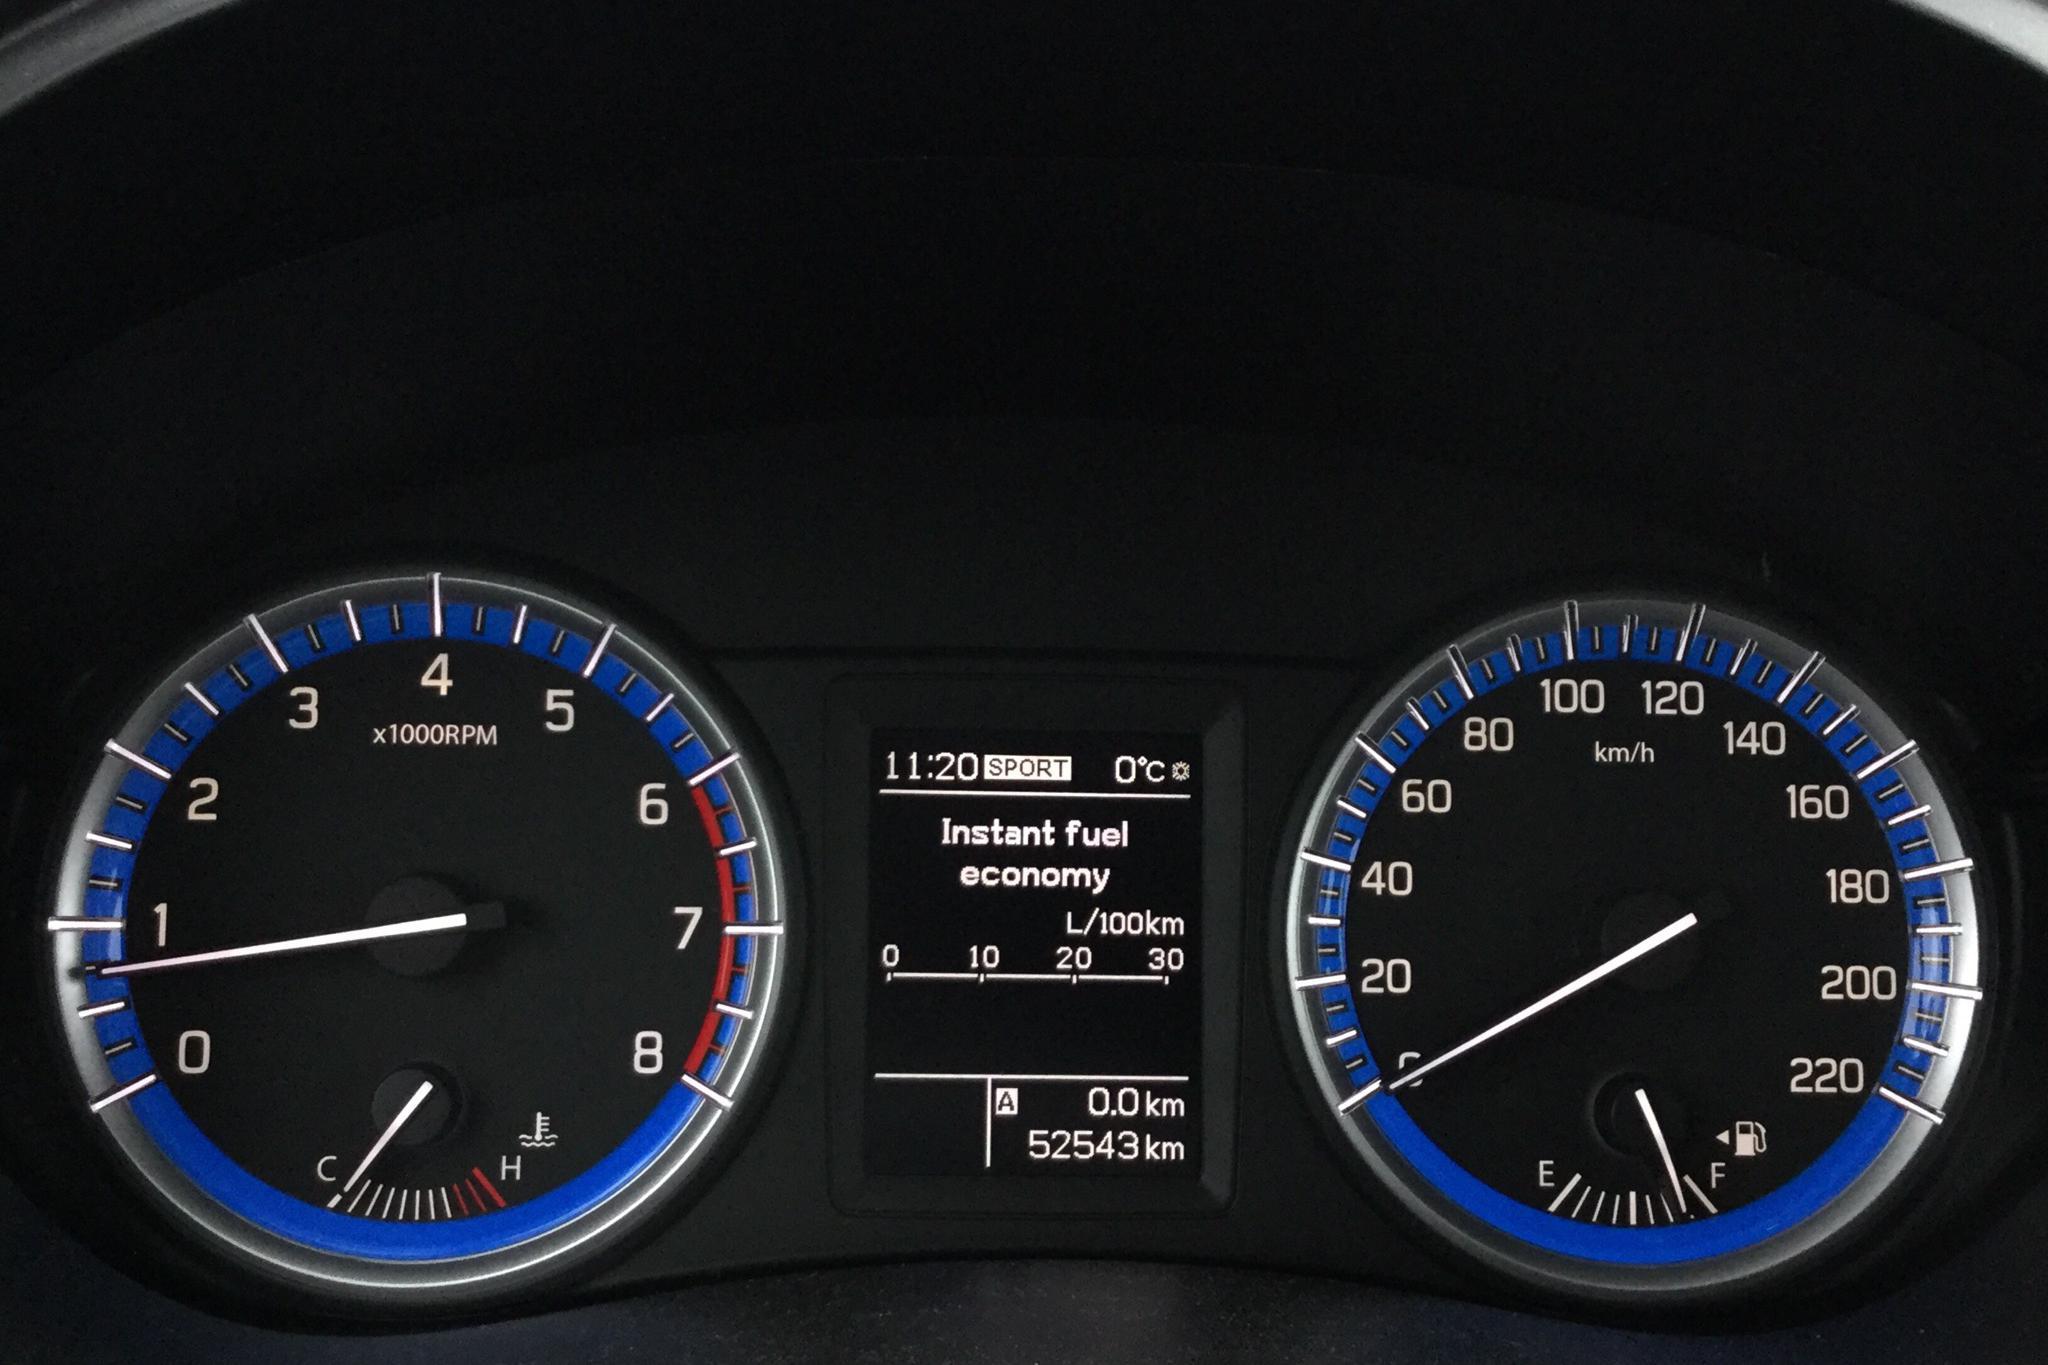 Suzuki S-Cross 1.6 4x4 (120hk) - 52 540 km - Manual - white - 2014